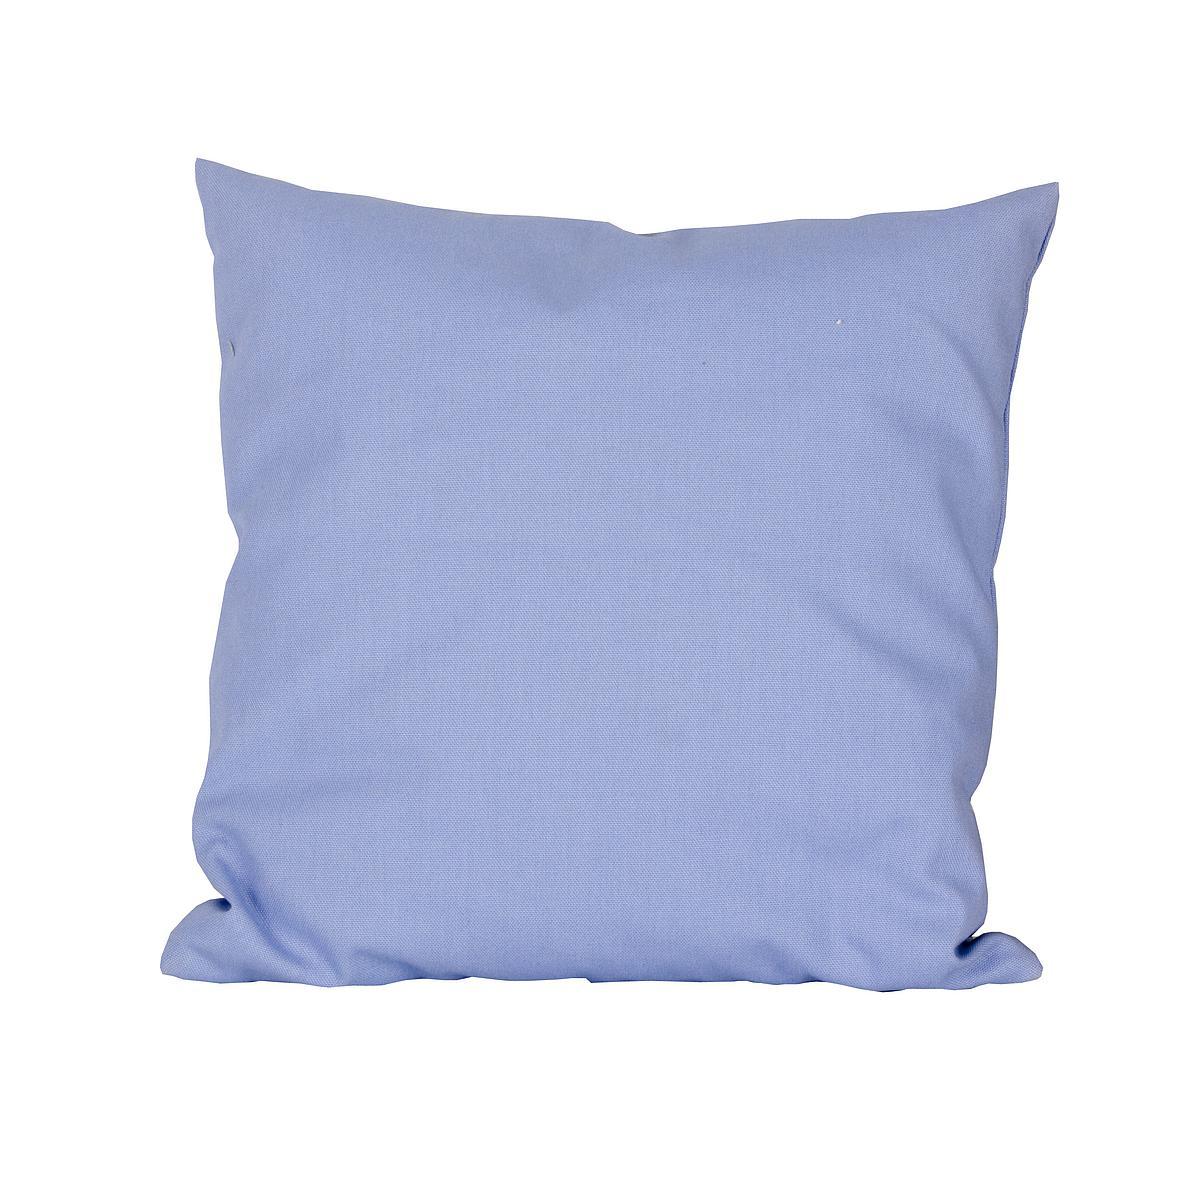 Kissen klein 40x40 DELUXE de Breuyn in hellblau